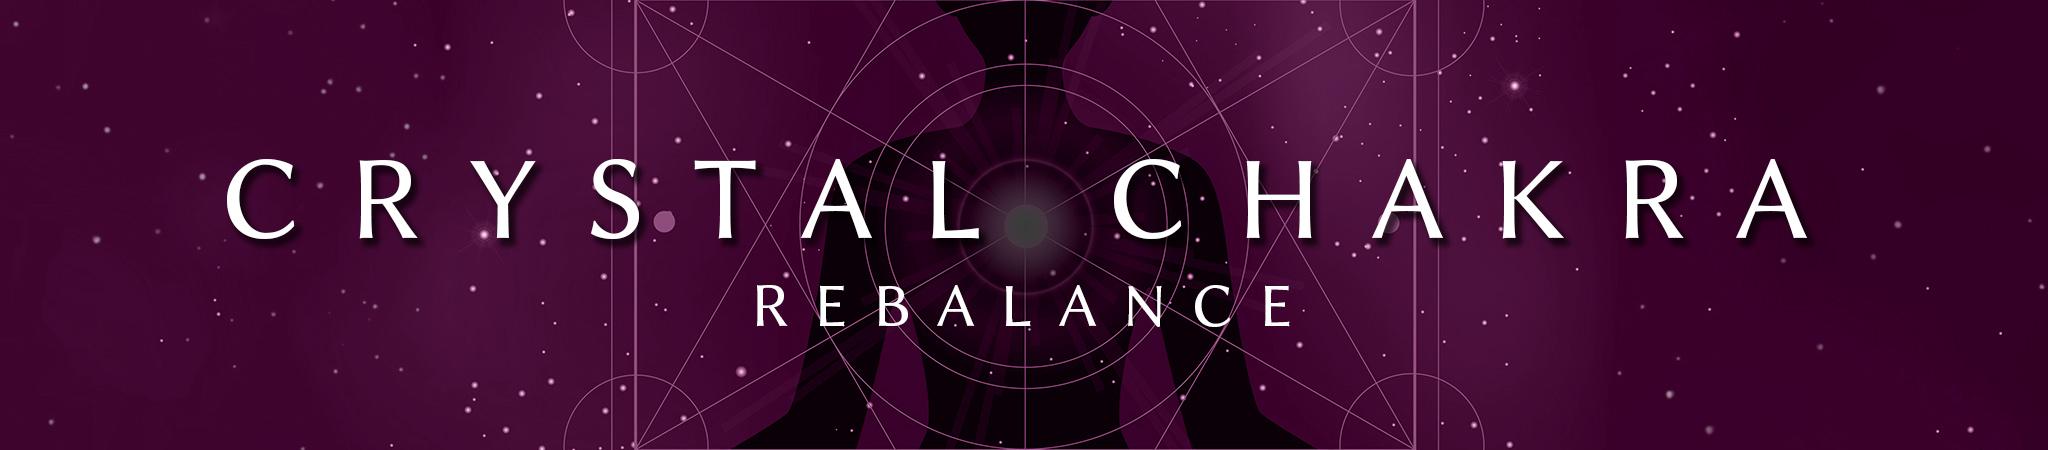 crystal chakra rebalance